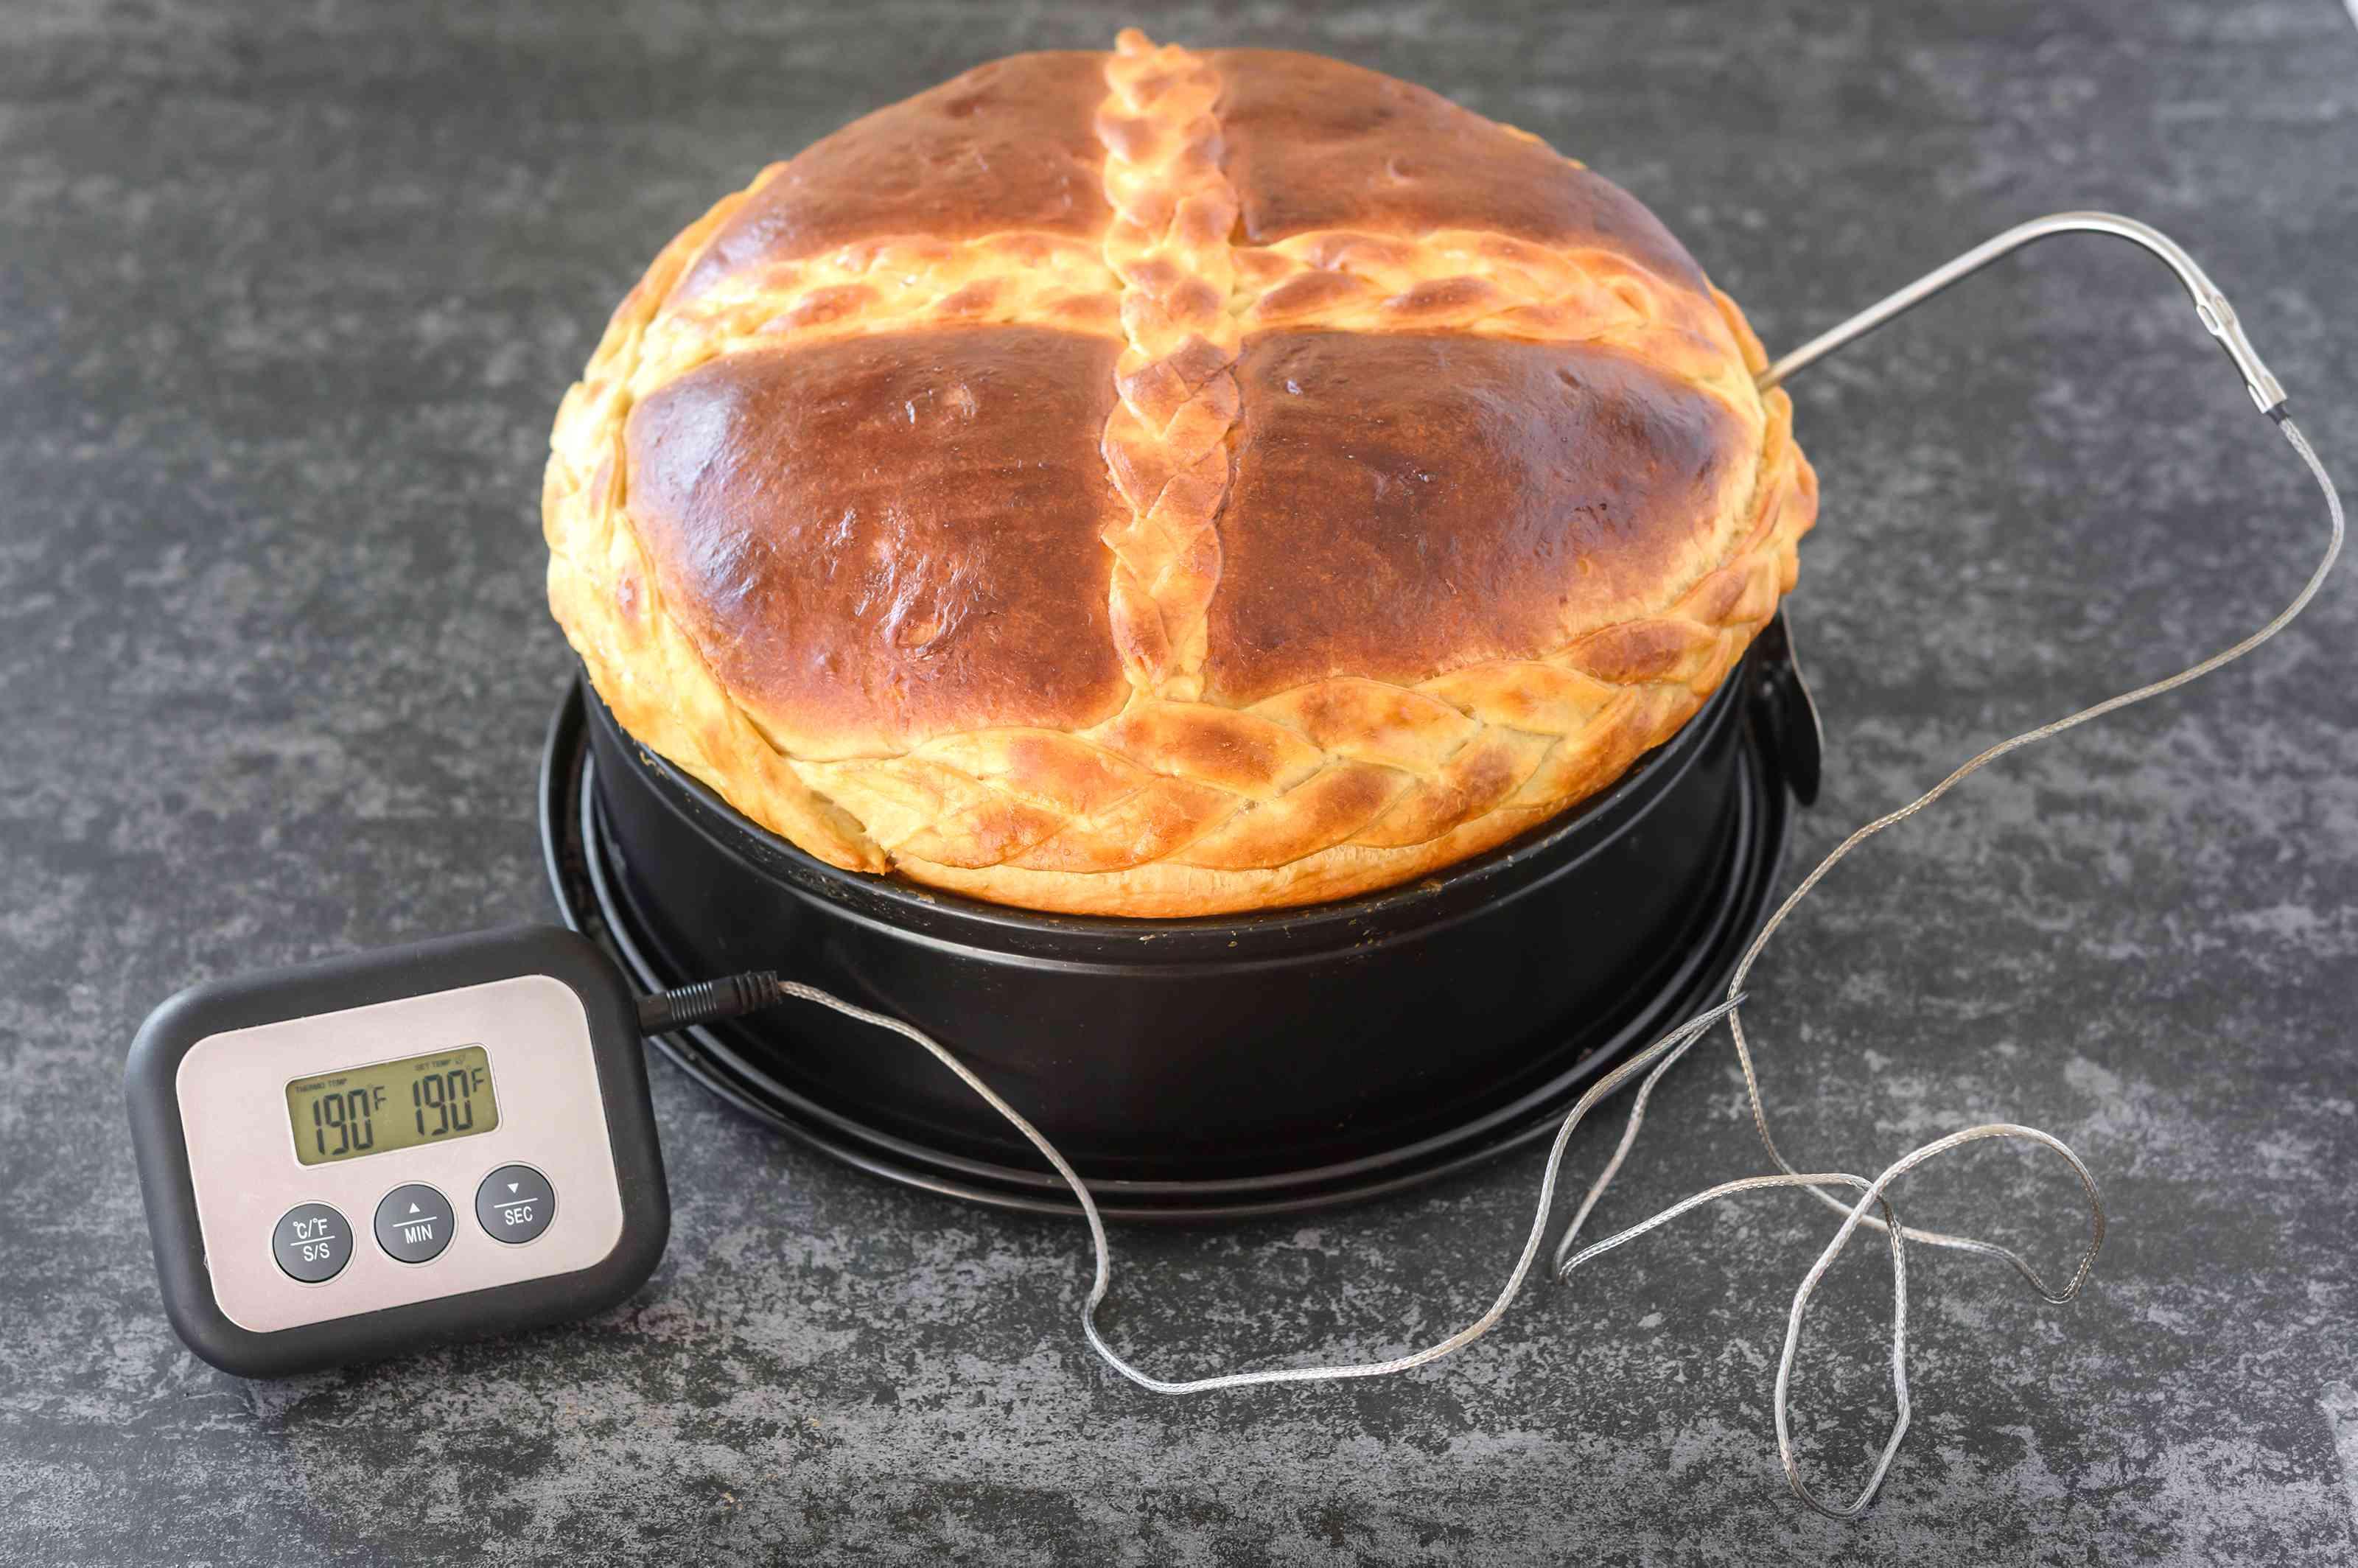 Make sculpting dough